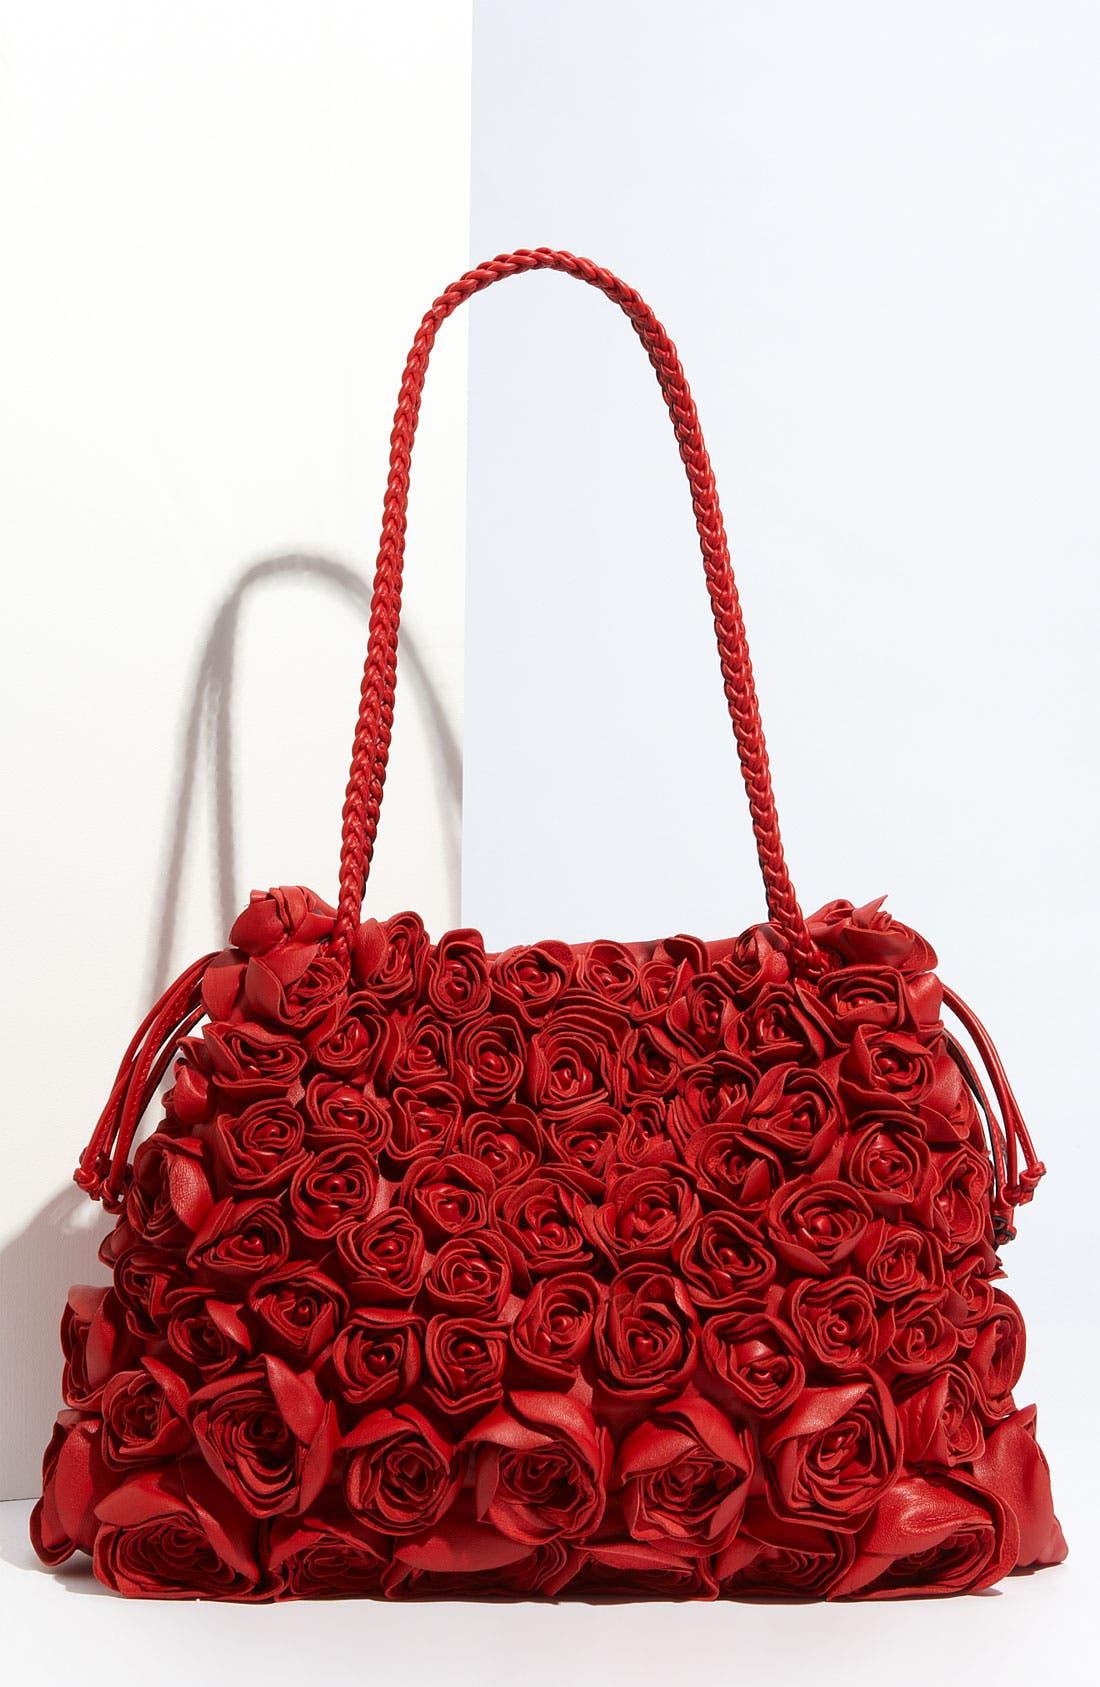 Main Image - Valentino 'Nappa Rose' Leather Tote